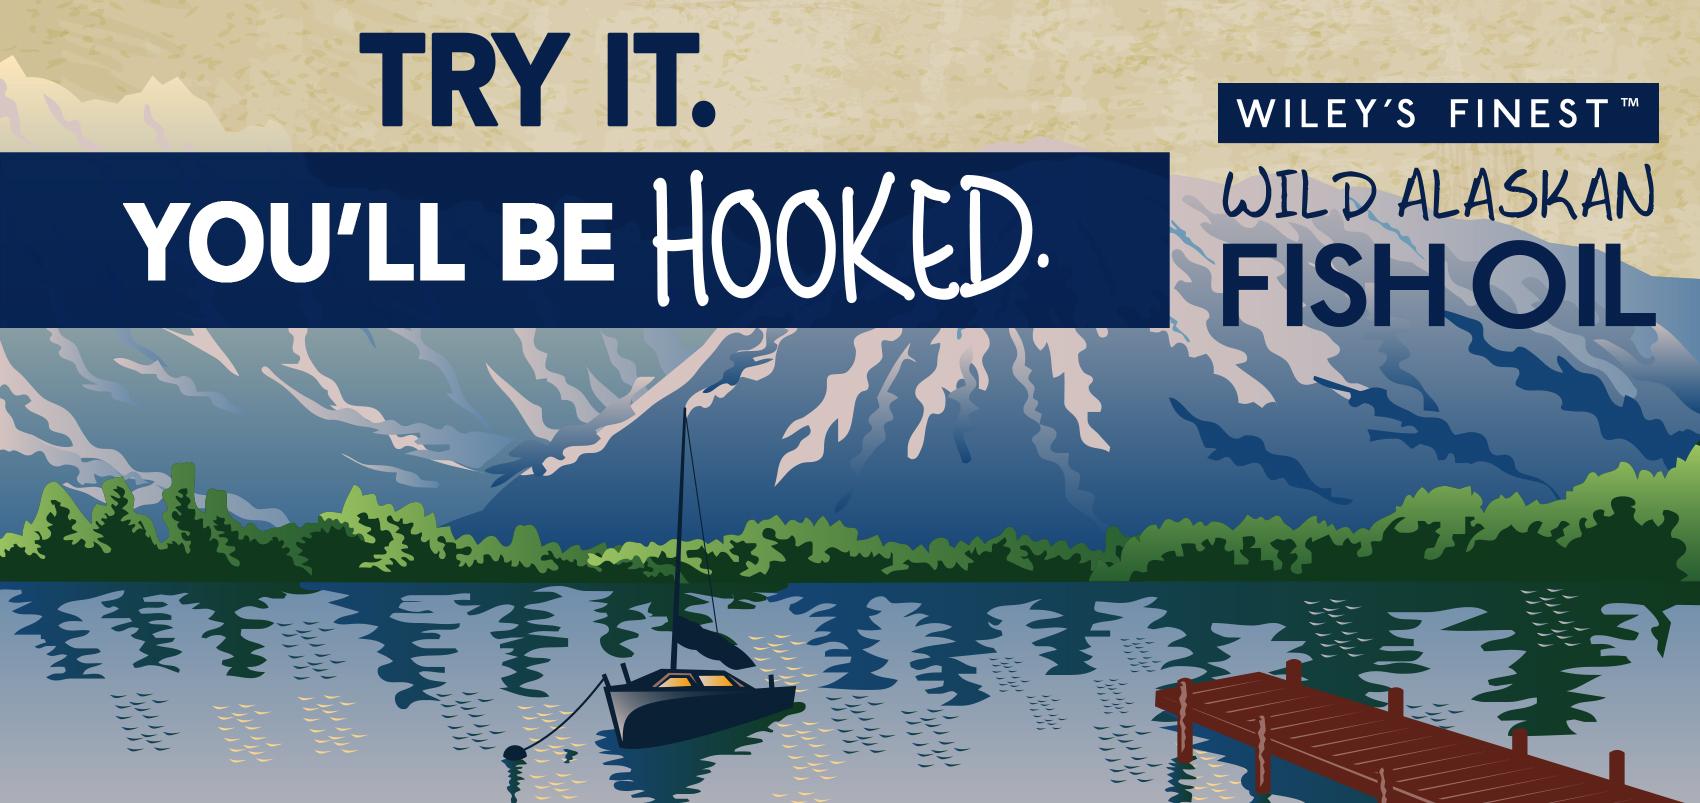 Wiley's Finest Wild Alaskan Fish Oil!